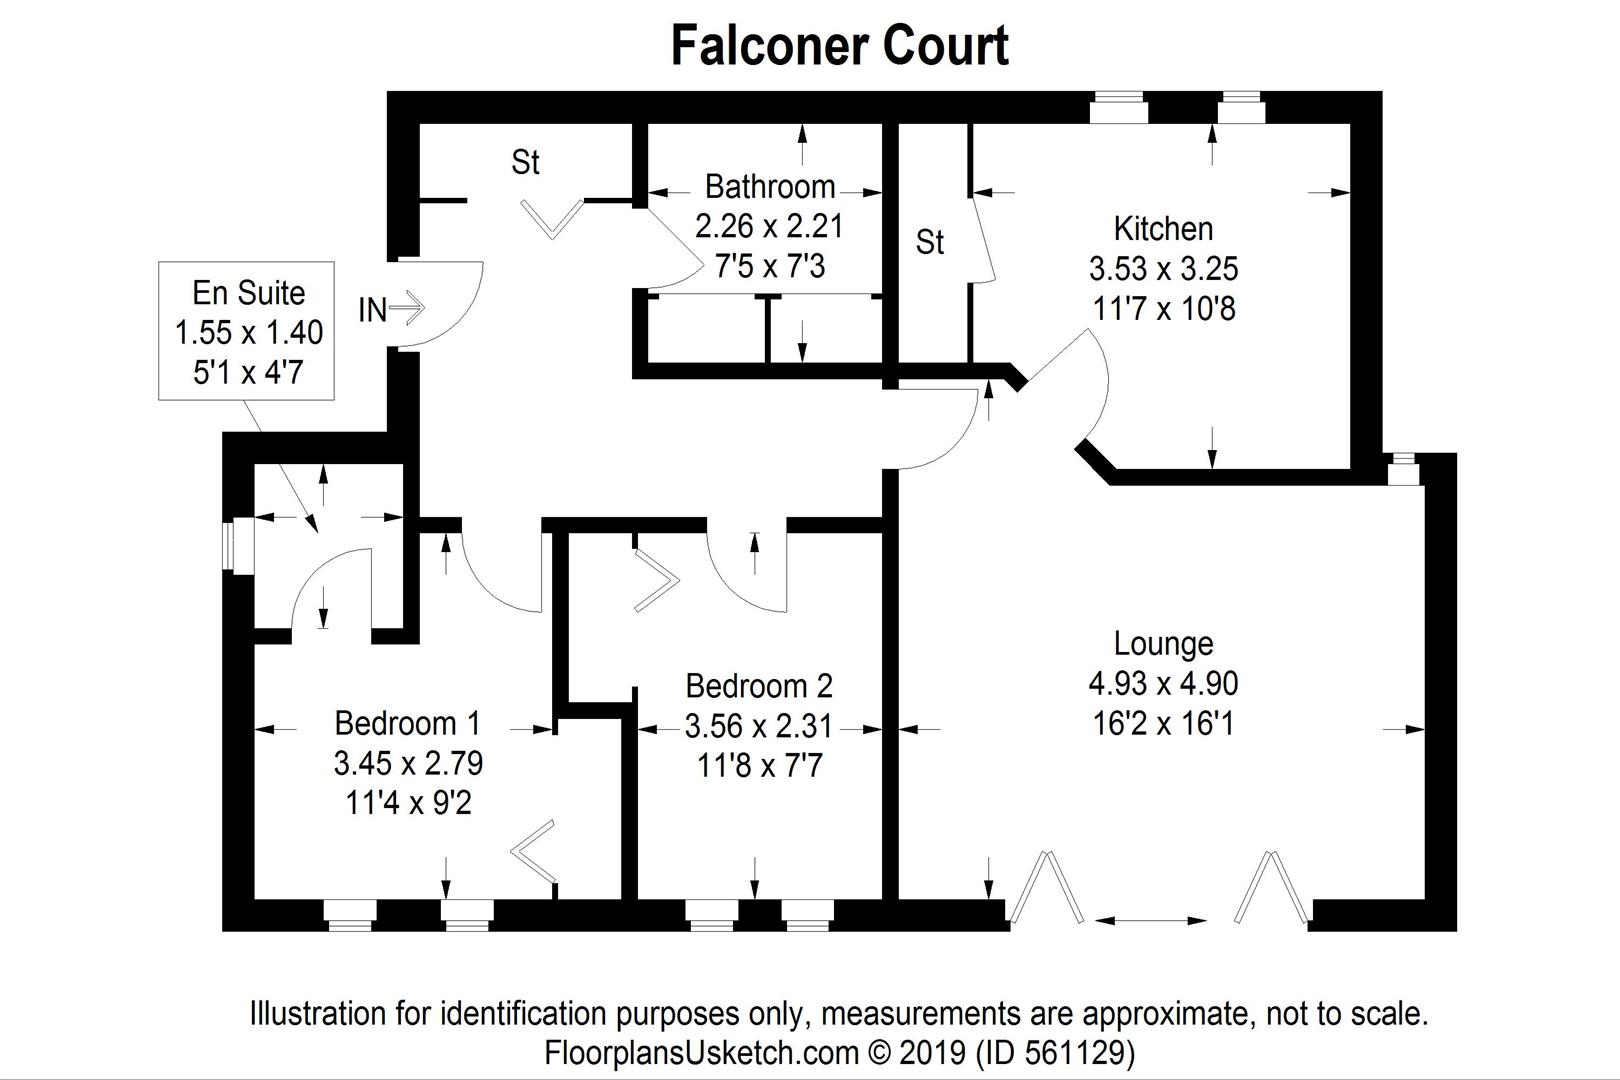 Final FP - Falconer Court.jpg